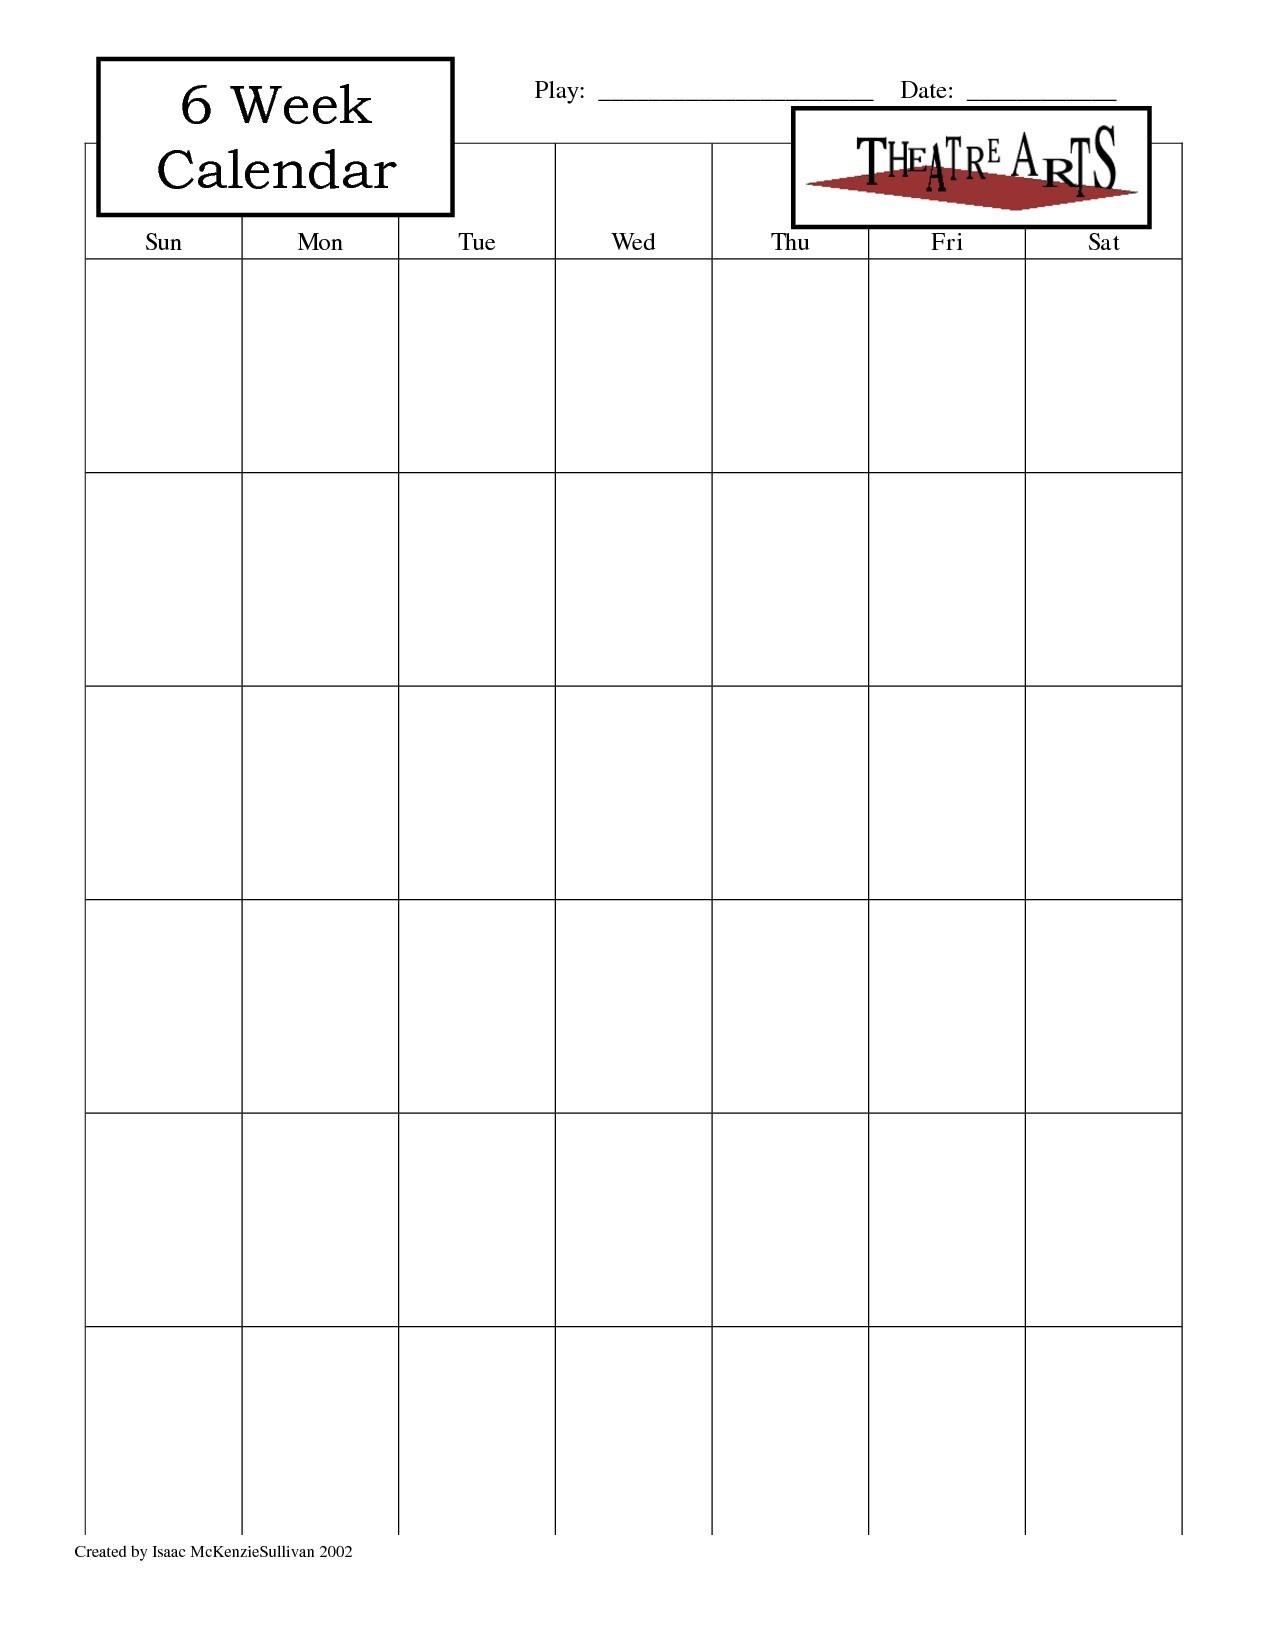 Blank 6 Week Calendar Template With Weeks 25971 Also On 6 Week  Blank 6 Week Calendar Template